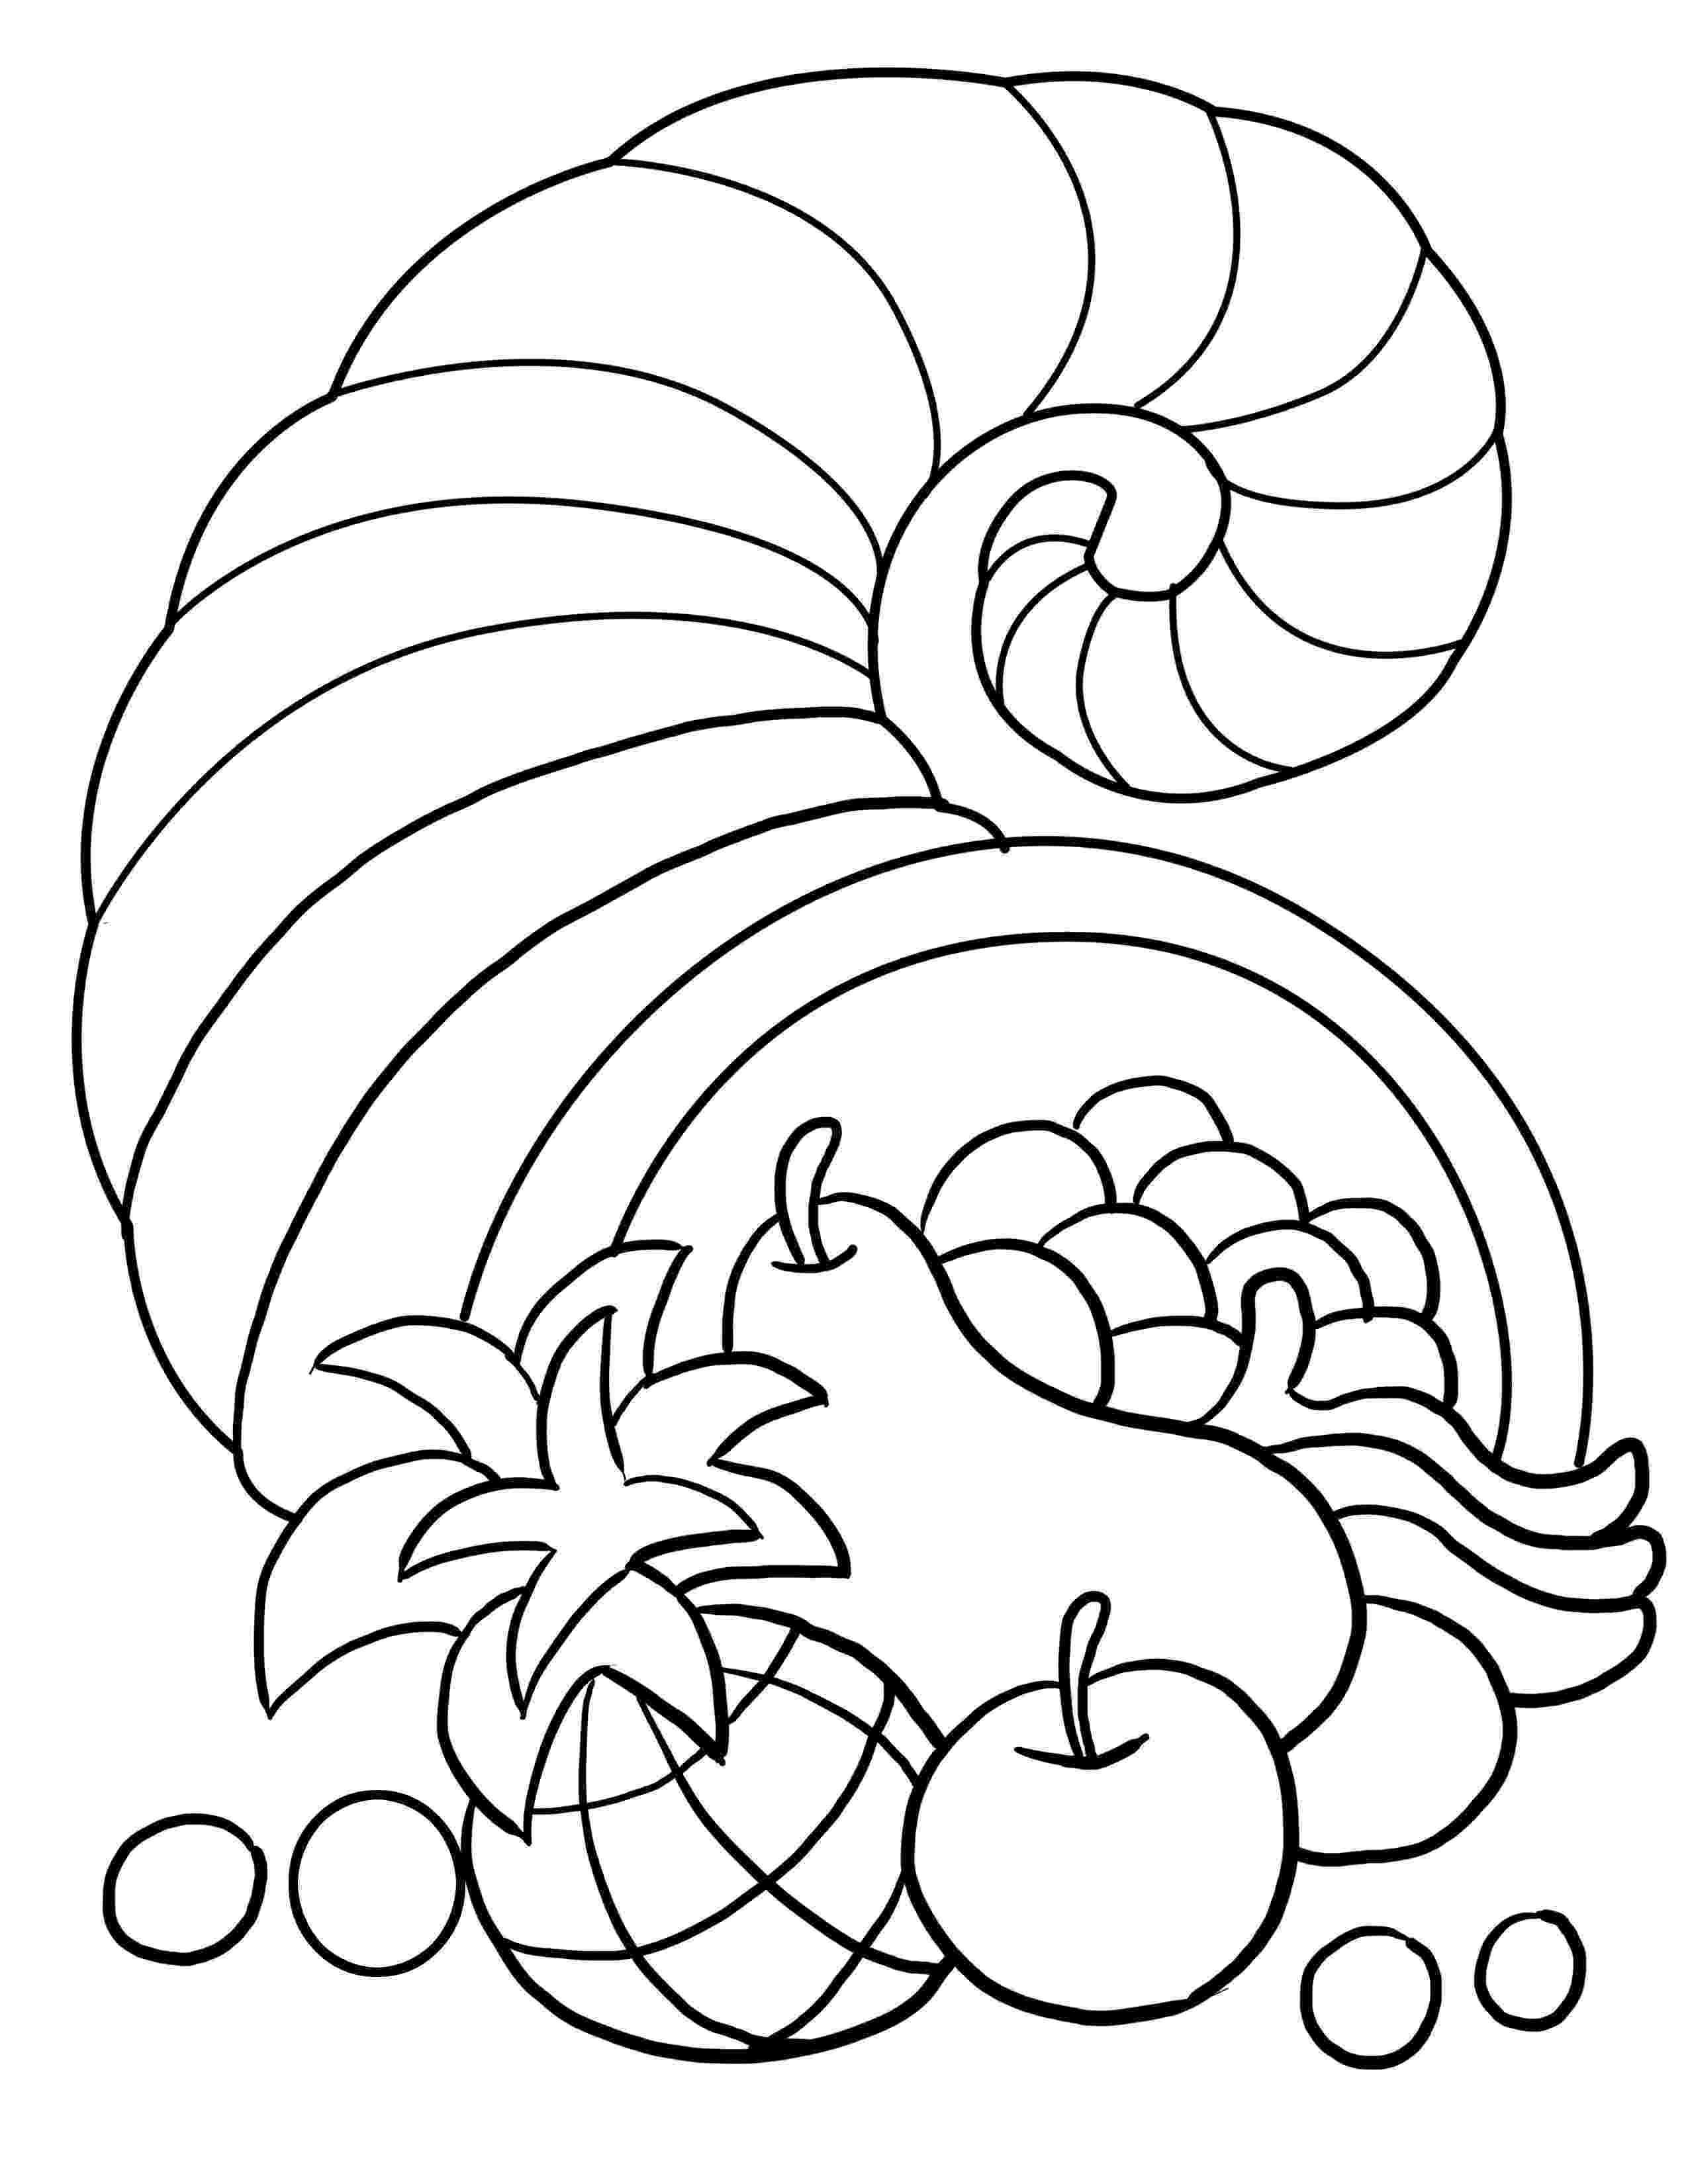 turkey coloring sheet thanksgiving coloring pages sheet turkey coloring